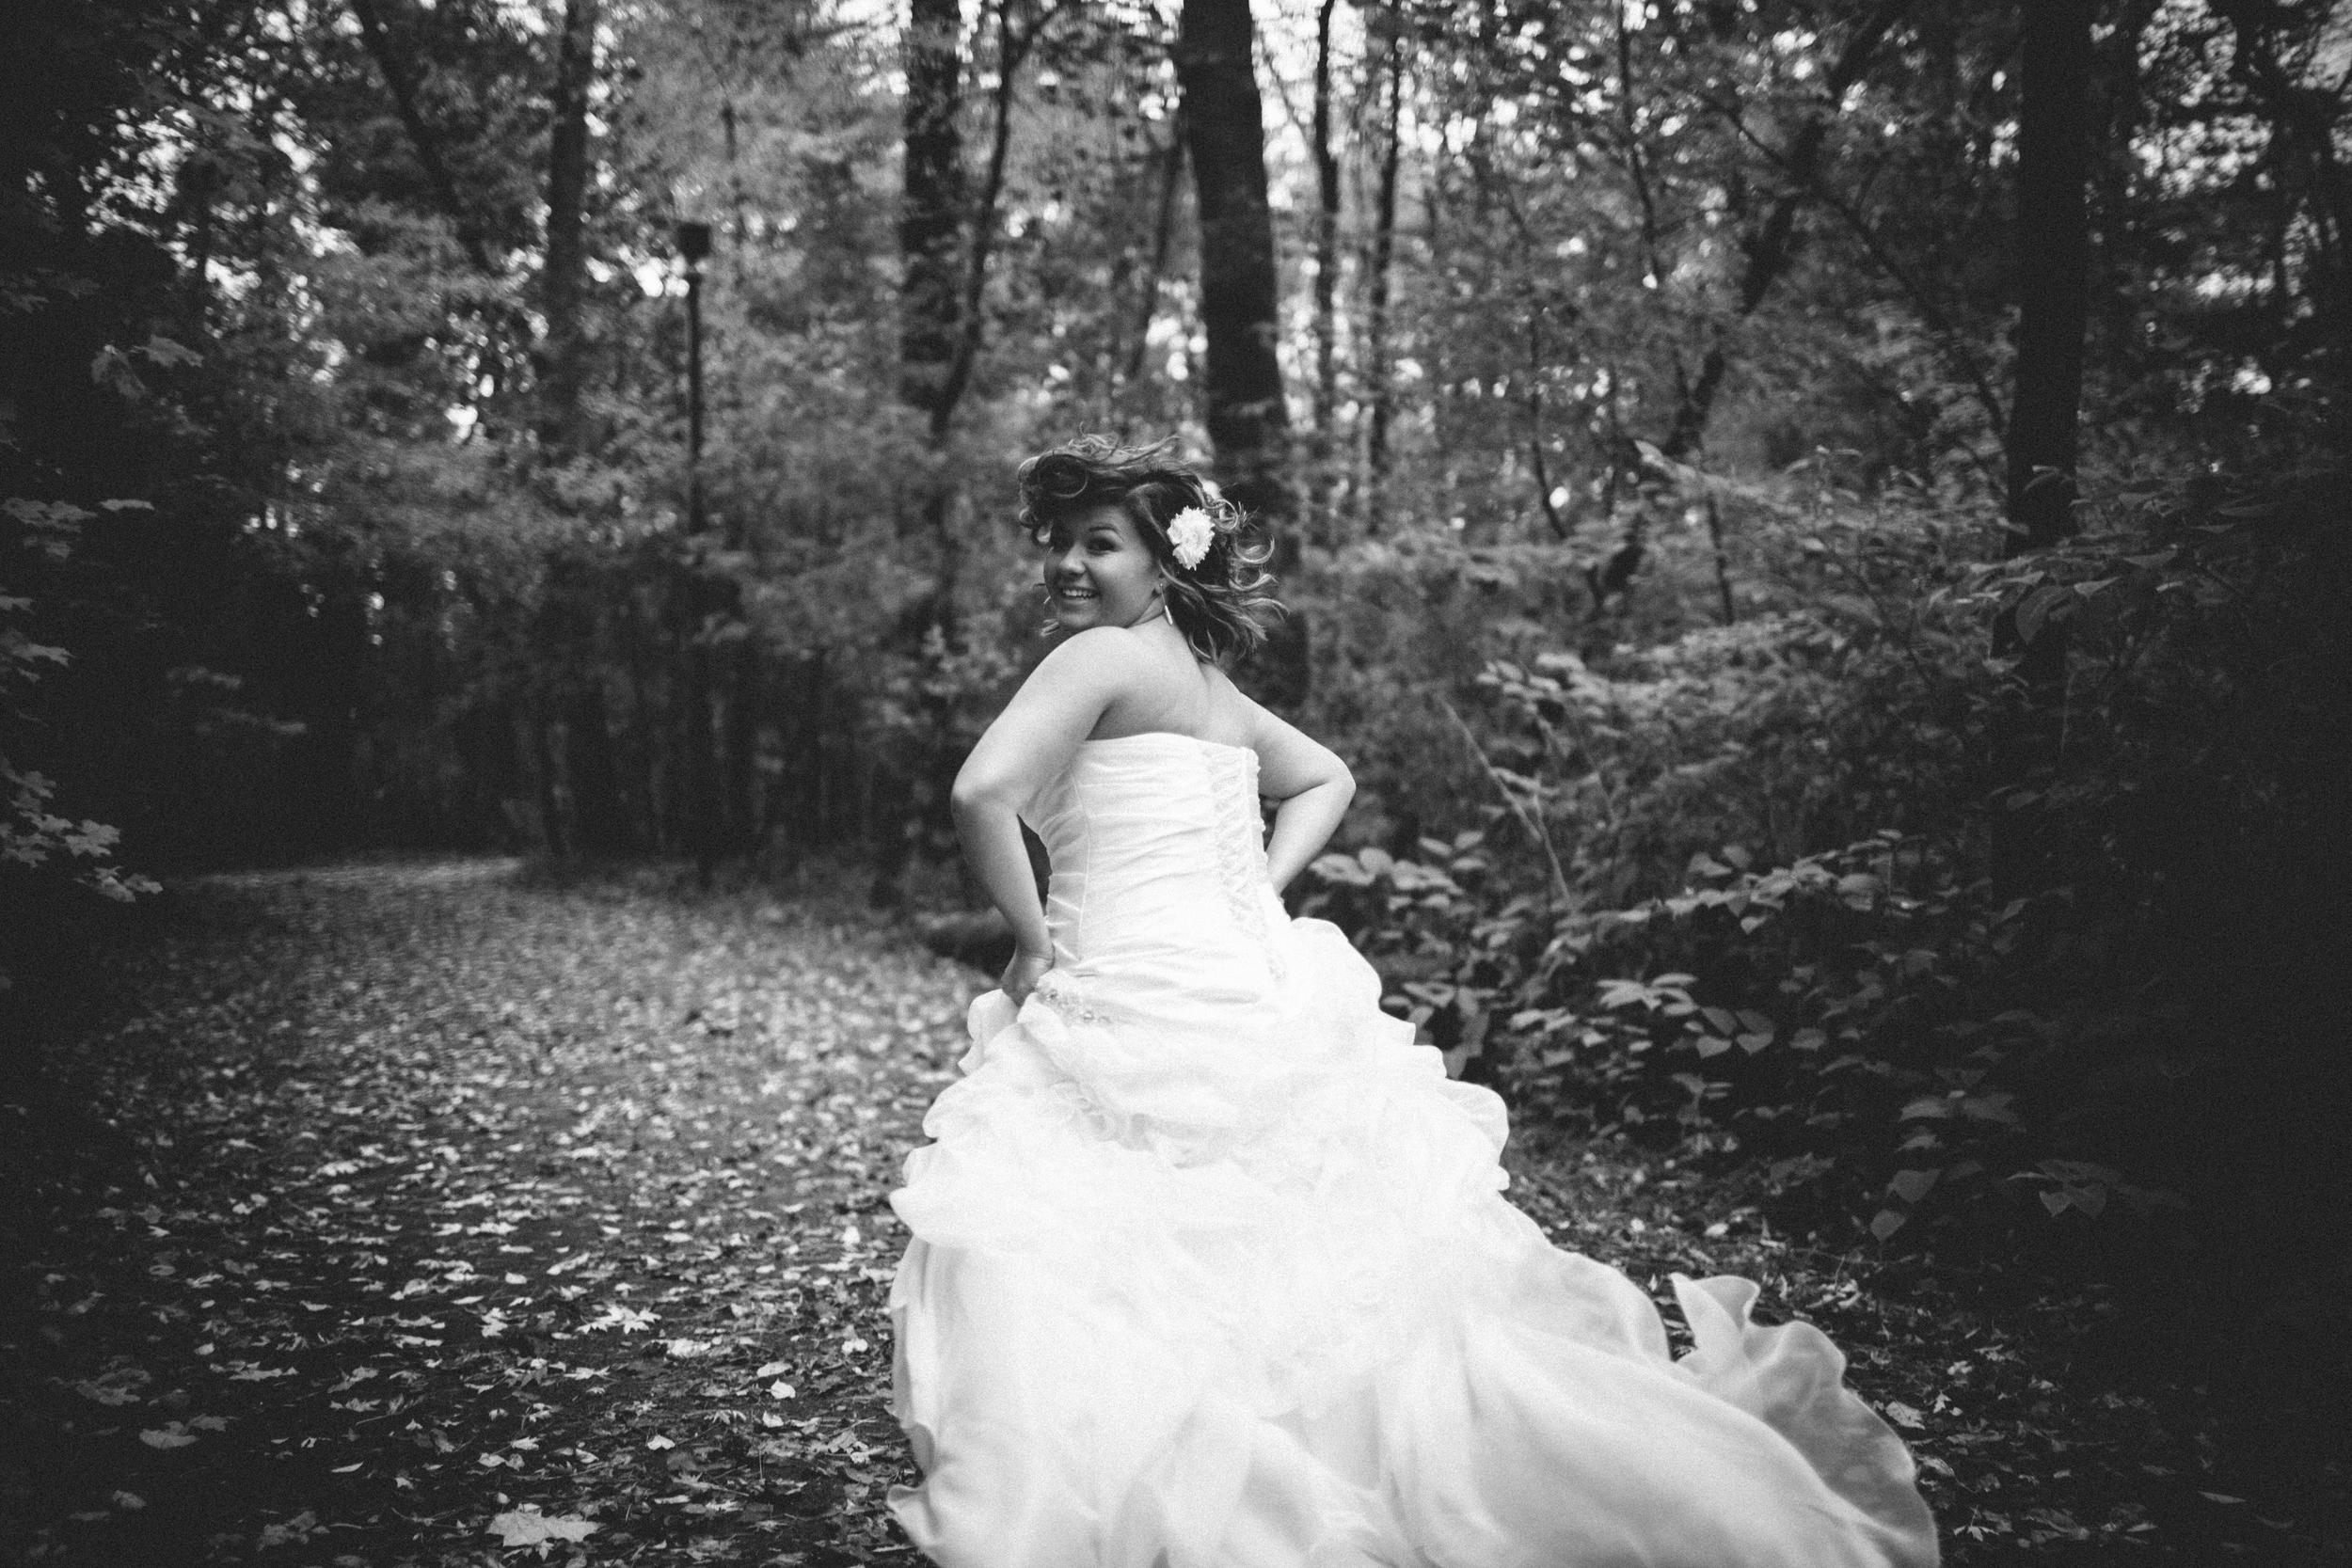 Stephanie-Kyle-paradise-banquet-hall-michael-rousseau-photography-best-toronto-wedding-photographer-documentary-wedding033.JPG